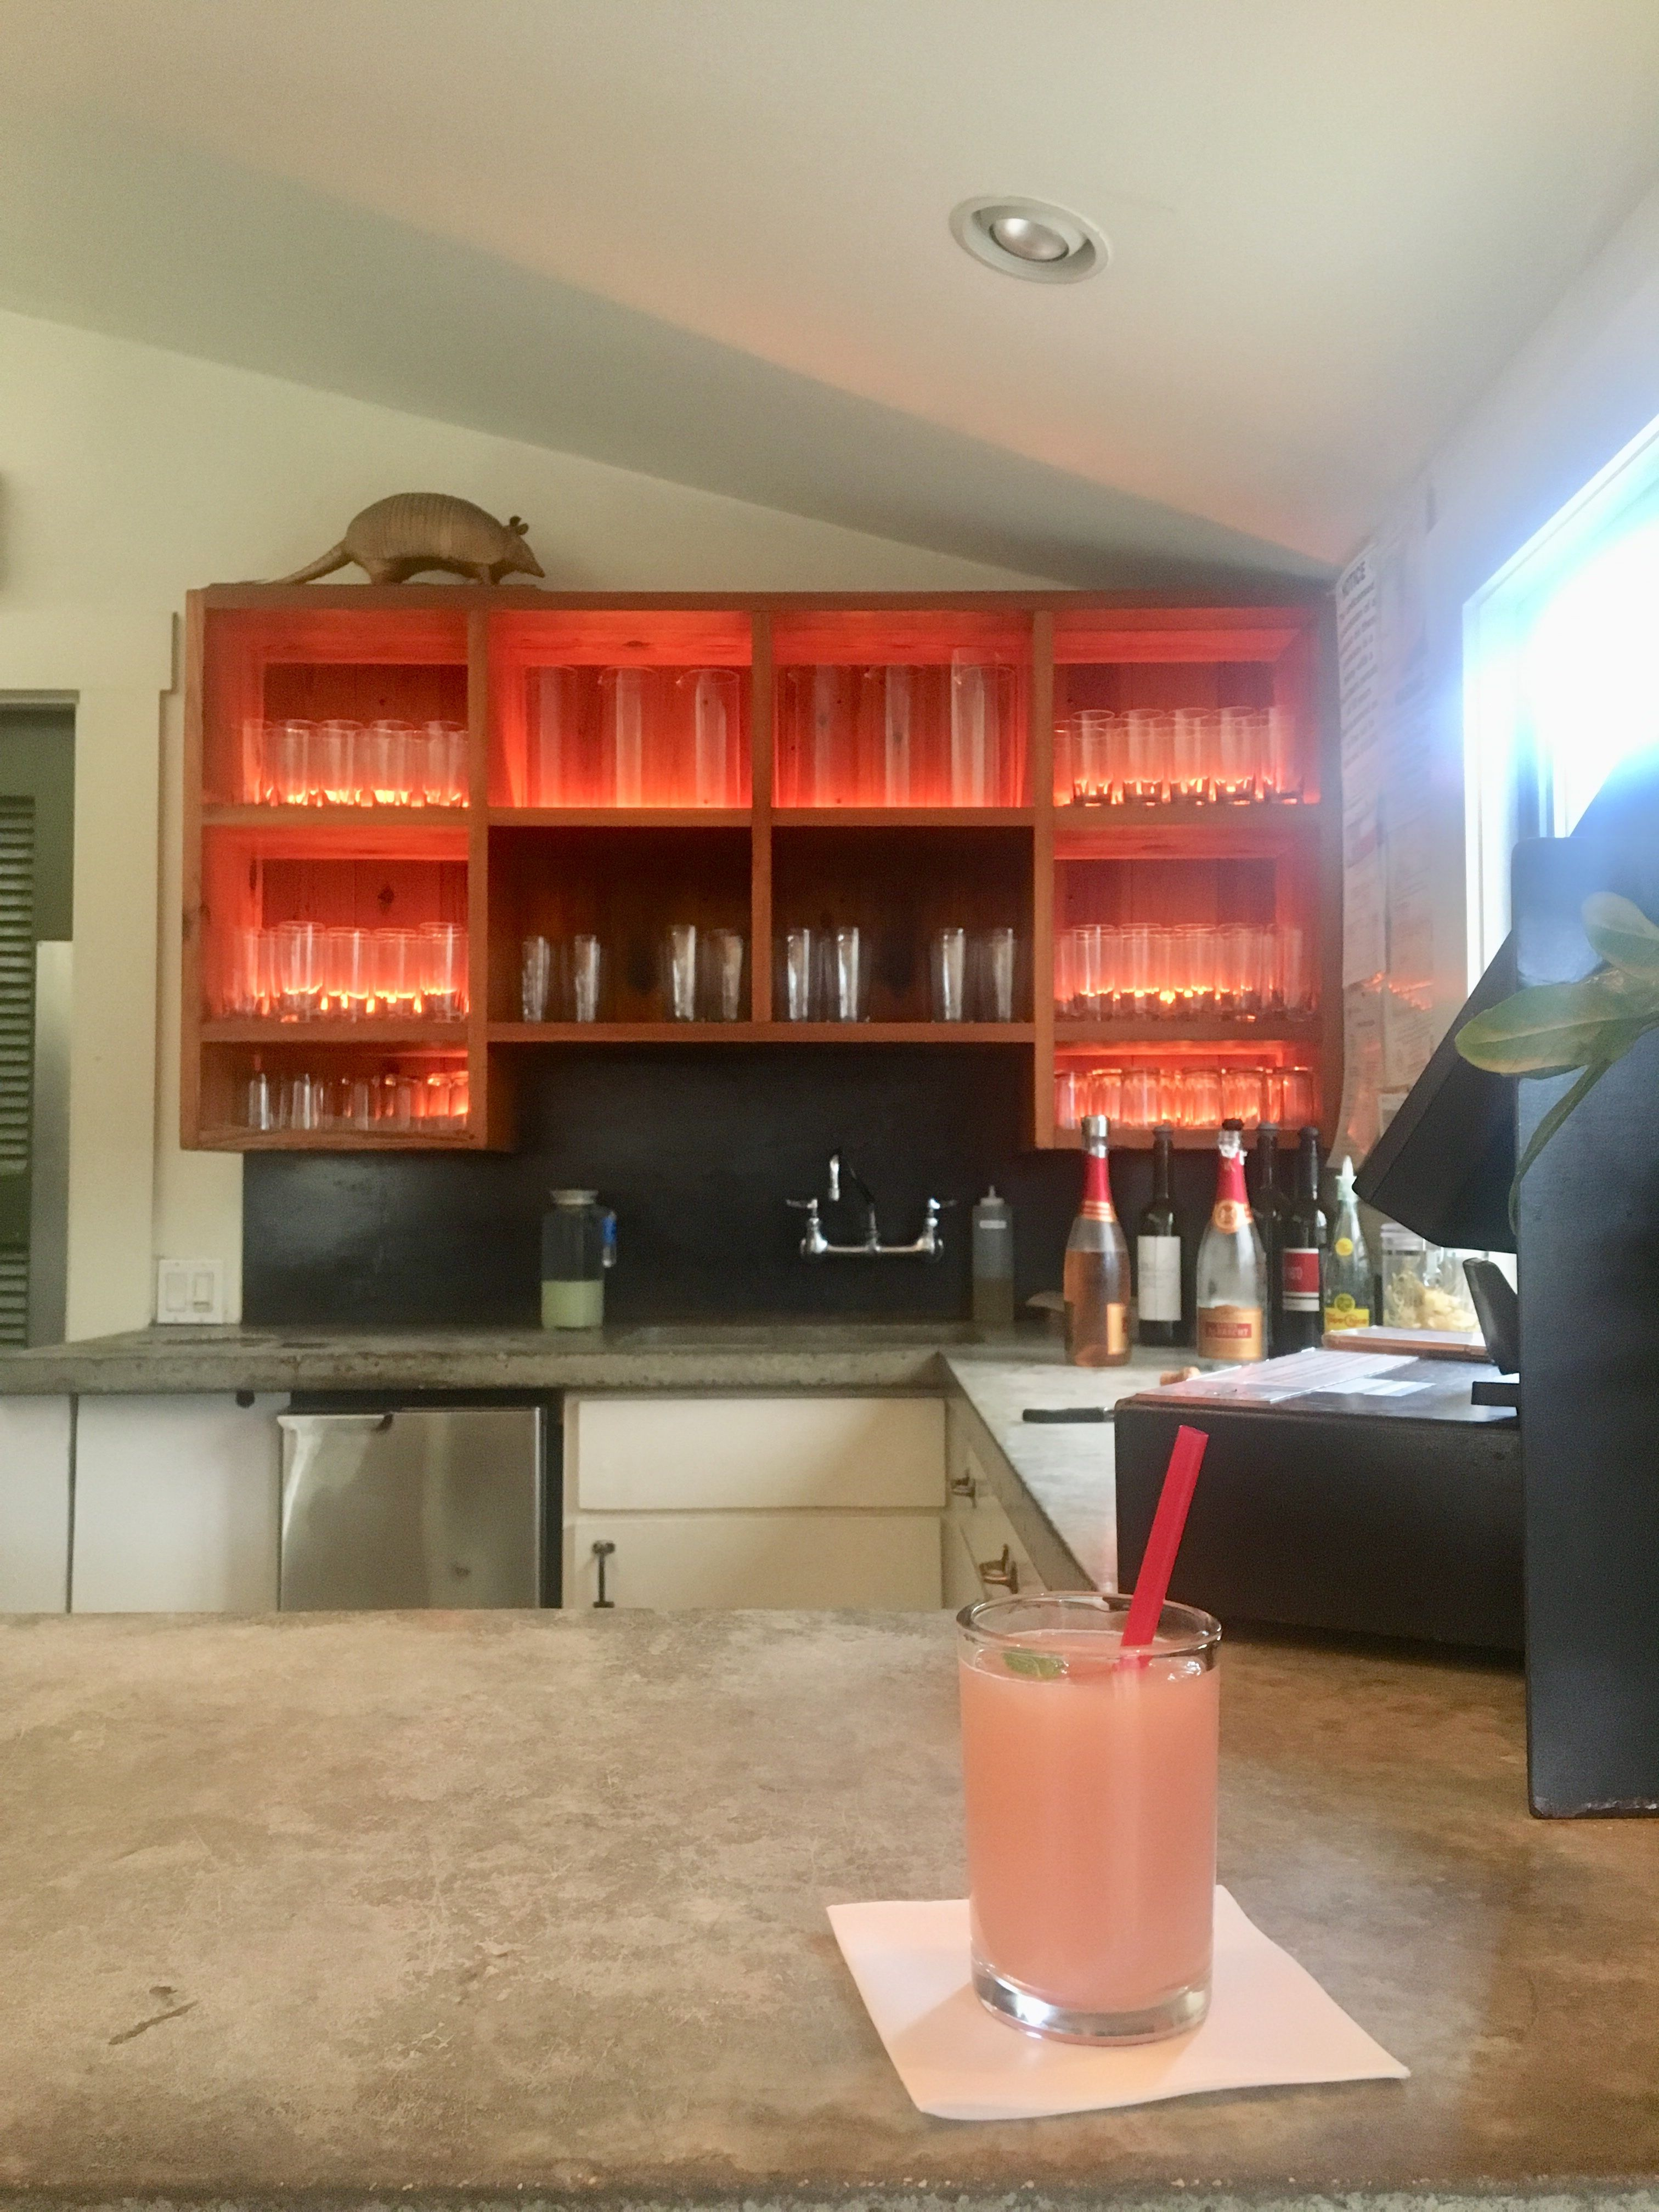 Hotel San Jose, Austin TX   Hotel san jose, Kitchen cabinets ...